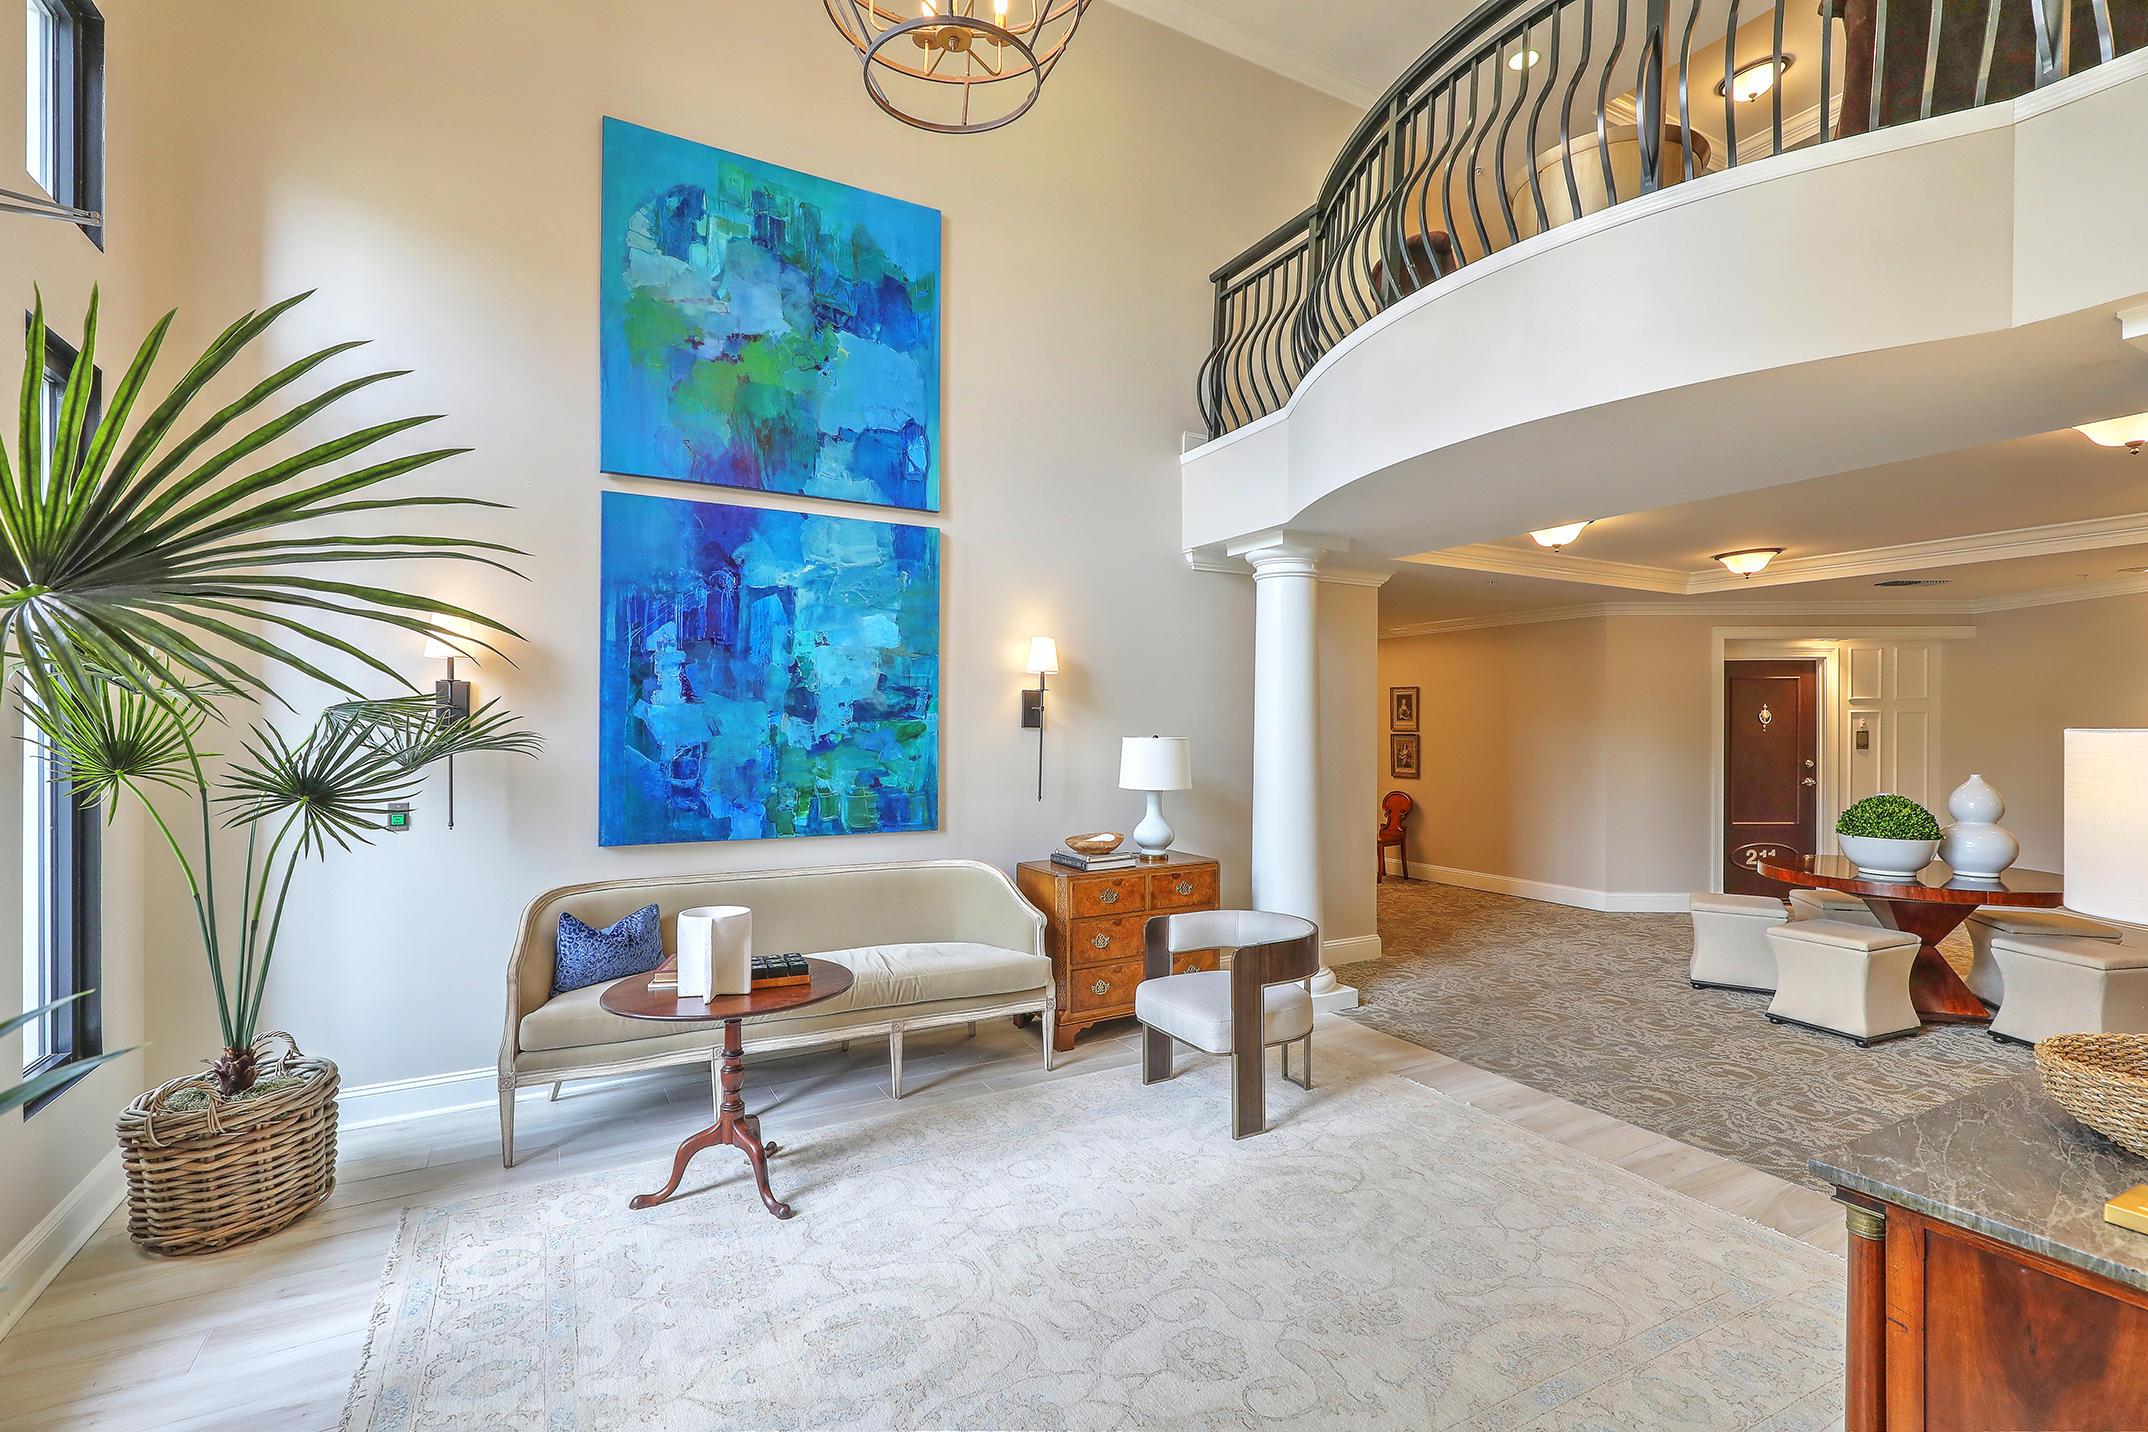 Albemarle Condos For Sale - 498 Albemarle, Charleston, SC - 3